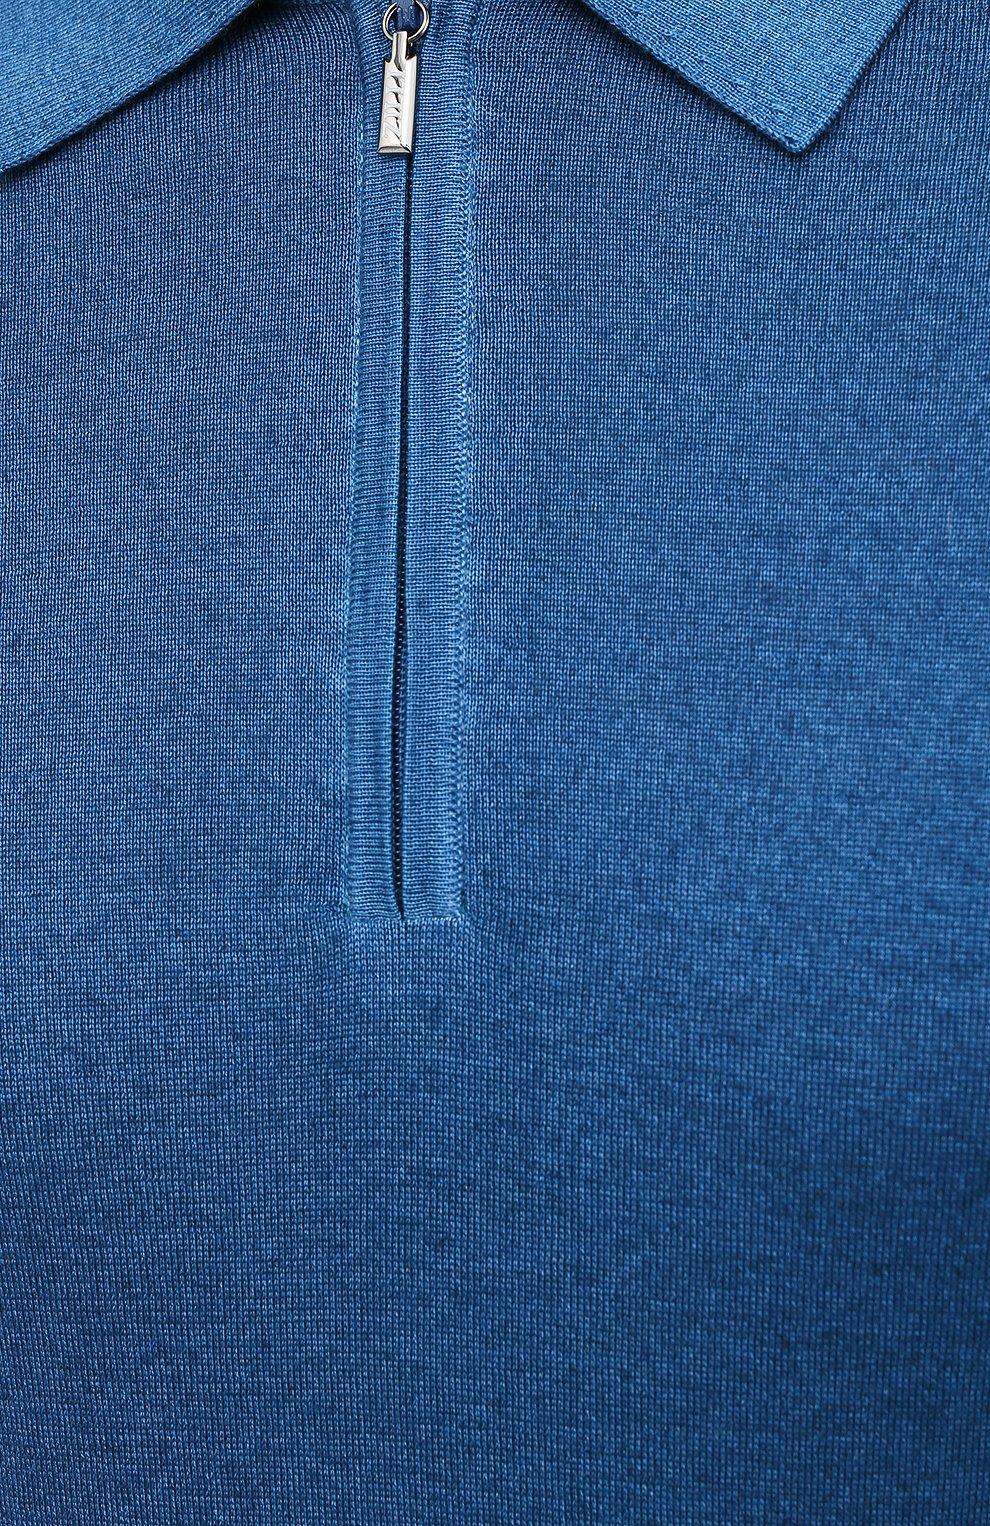 Мужское поло из кашемира и шелка ZILLI синего цвета, арт. MBU-PZ002-NUAG1/ML01 | Фото 6